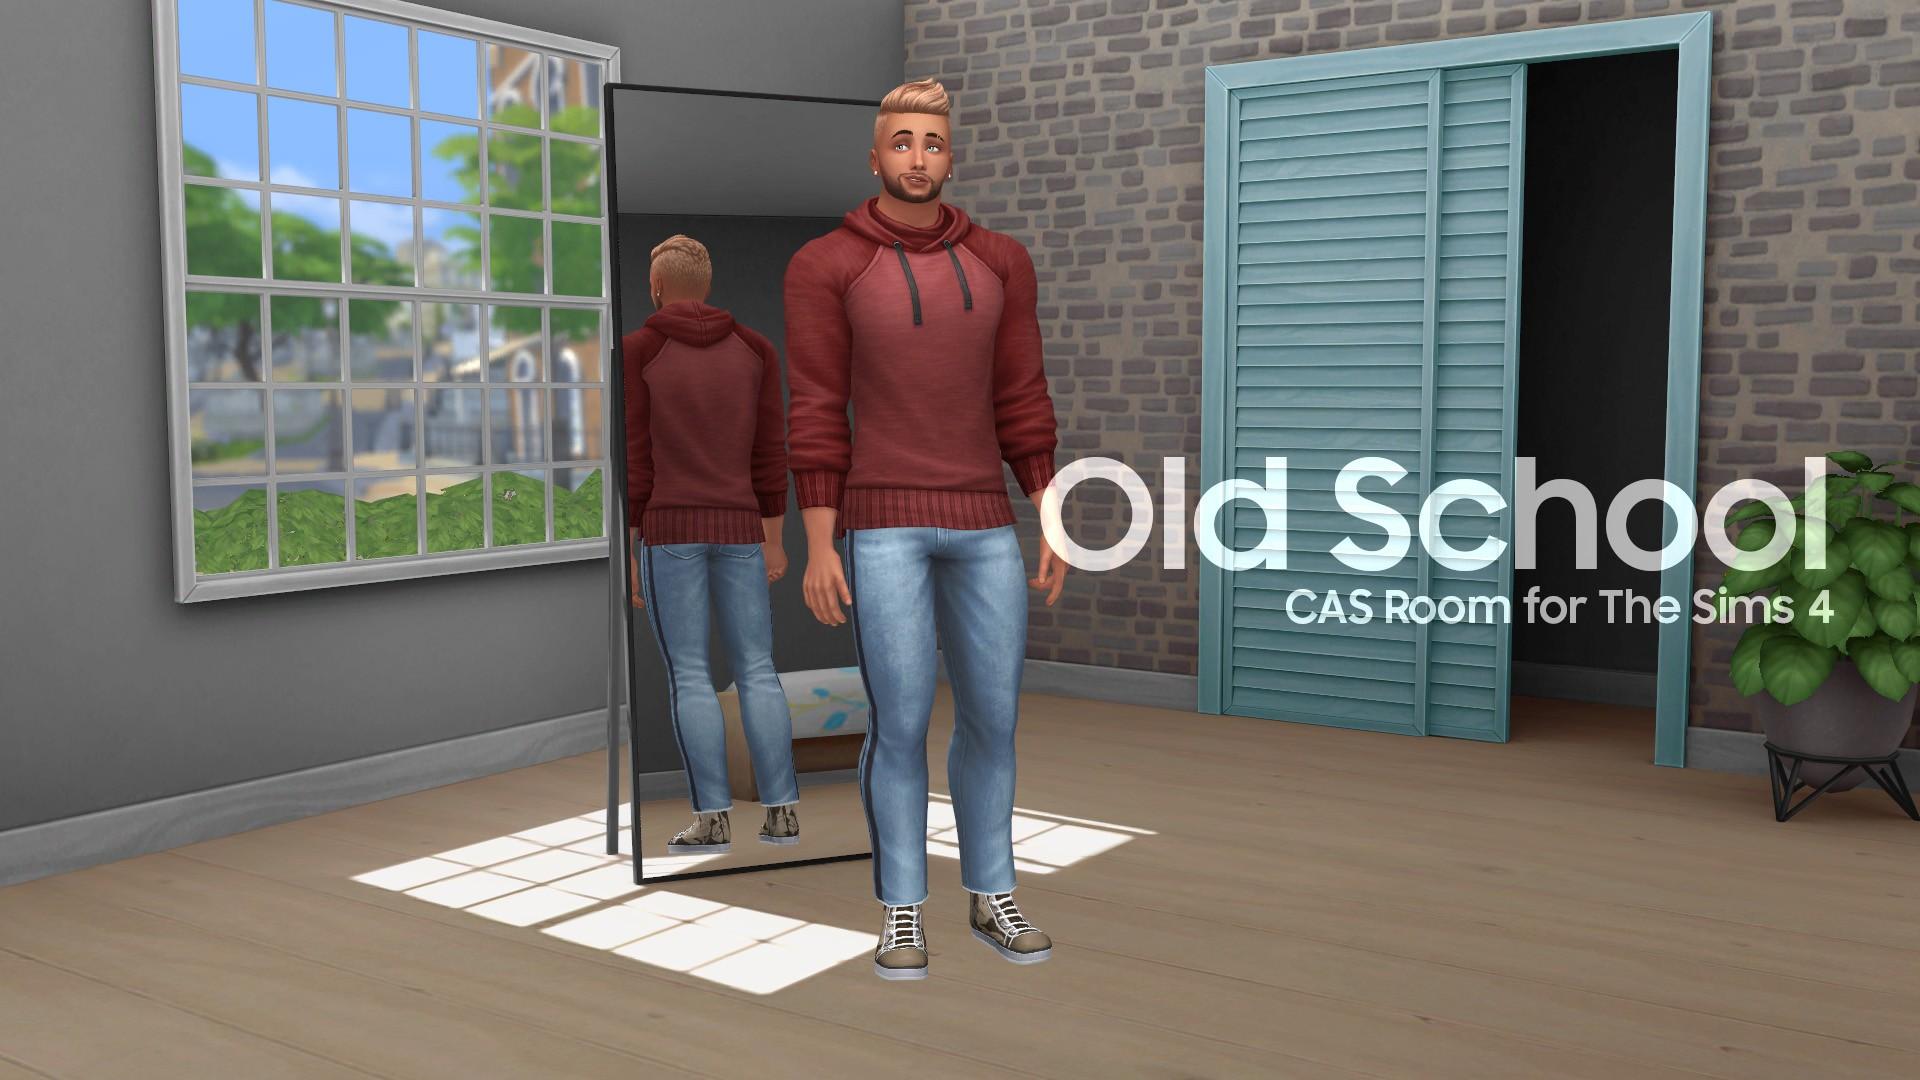 Мод на замену фона в КАС Sims 4: Old School комната из Sims 3